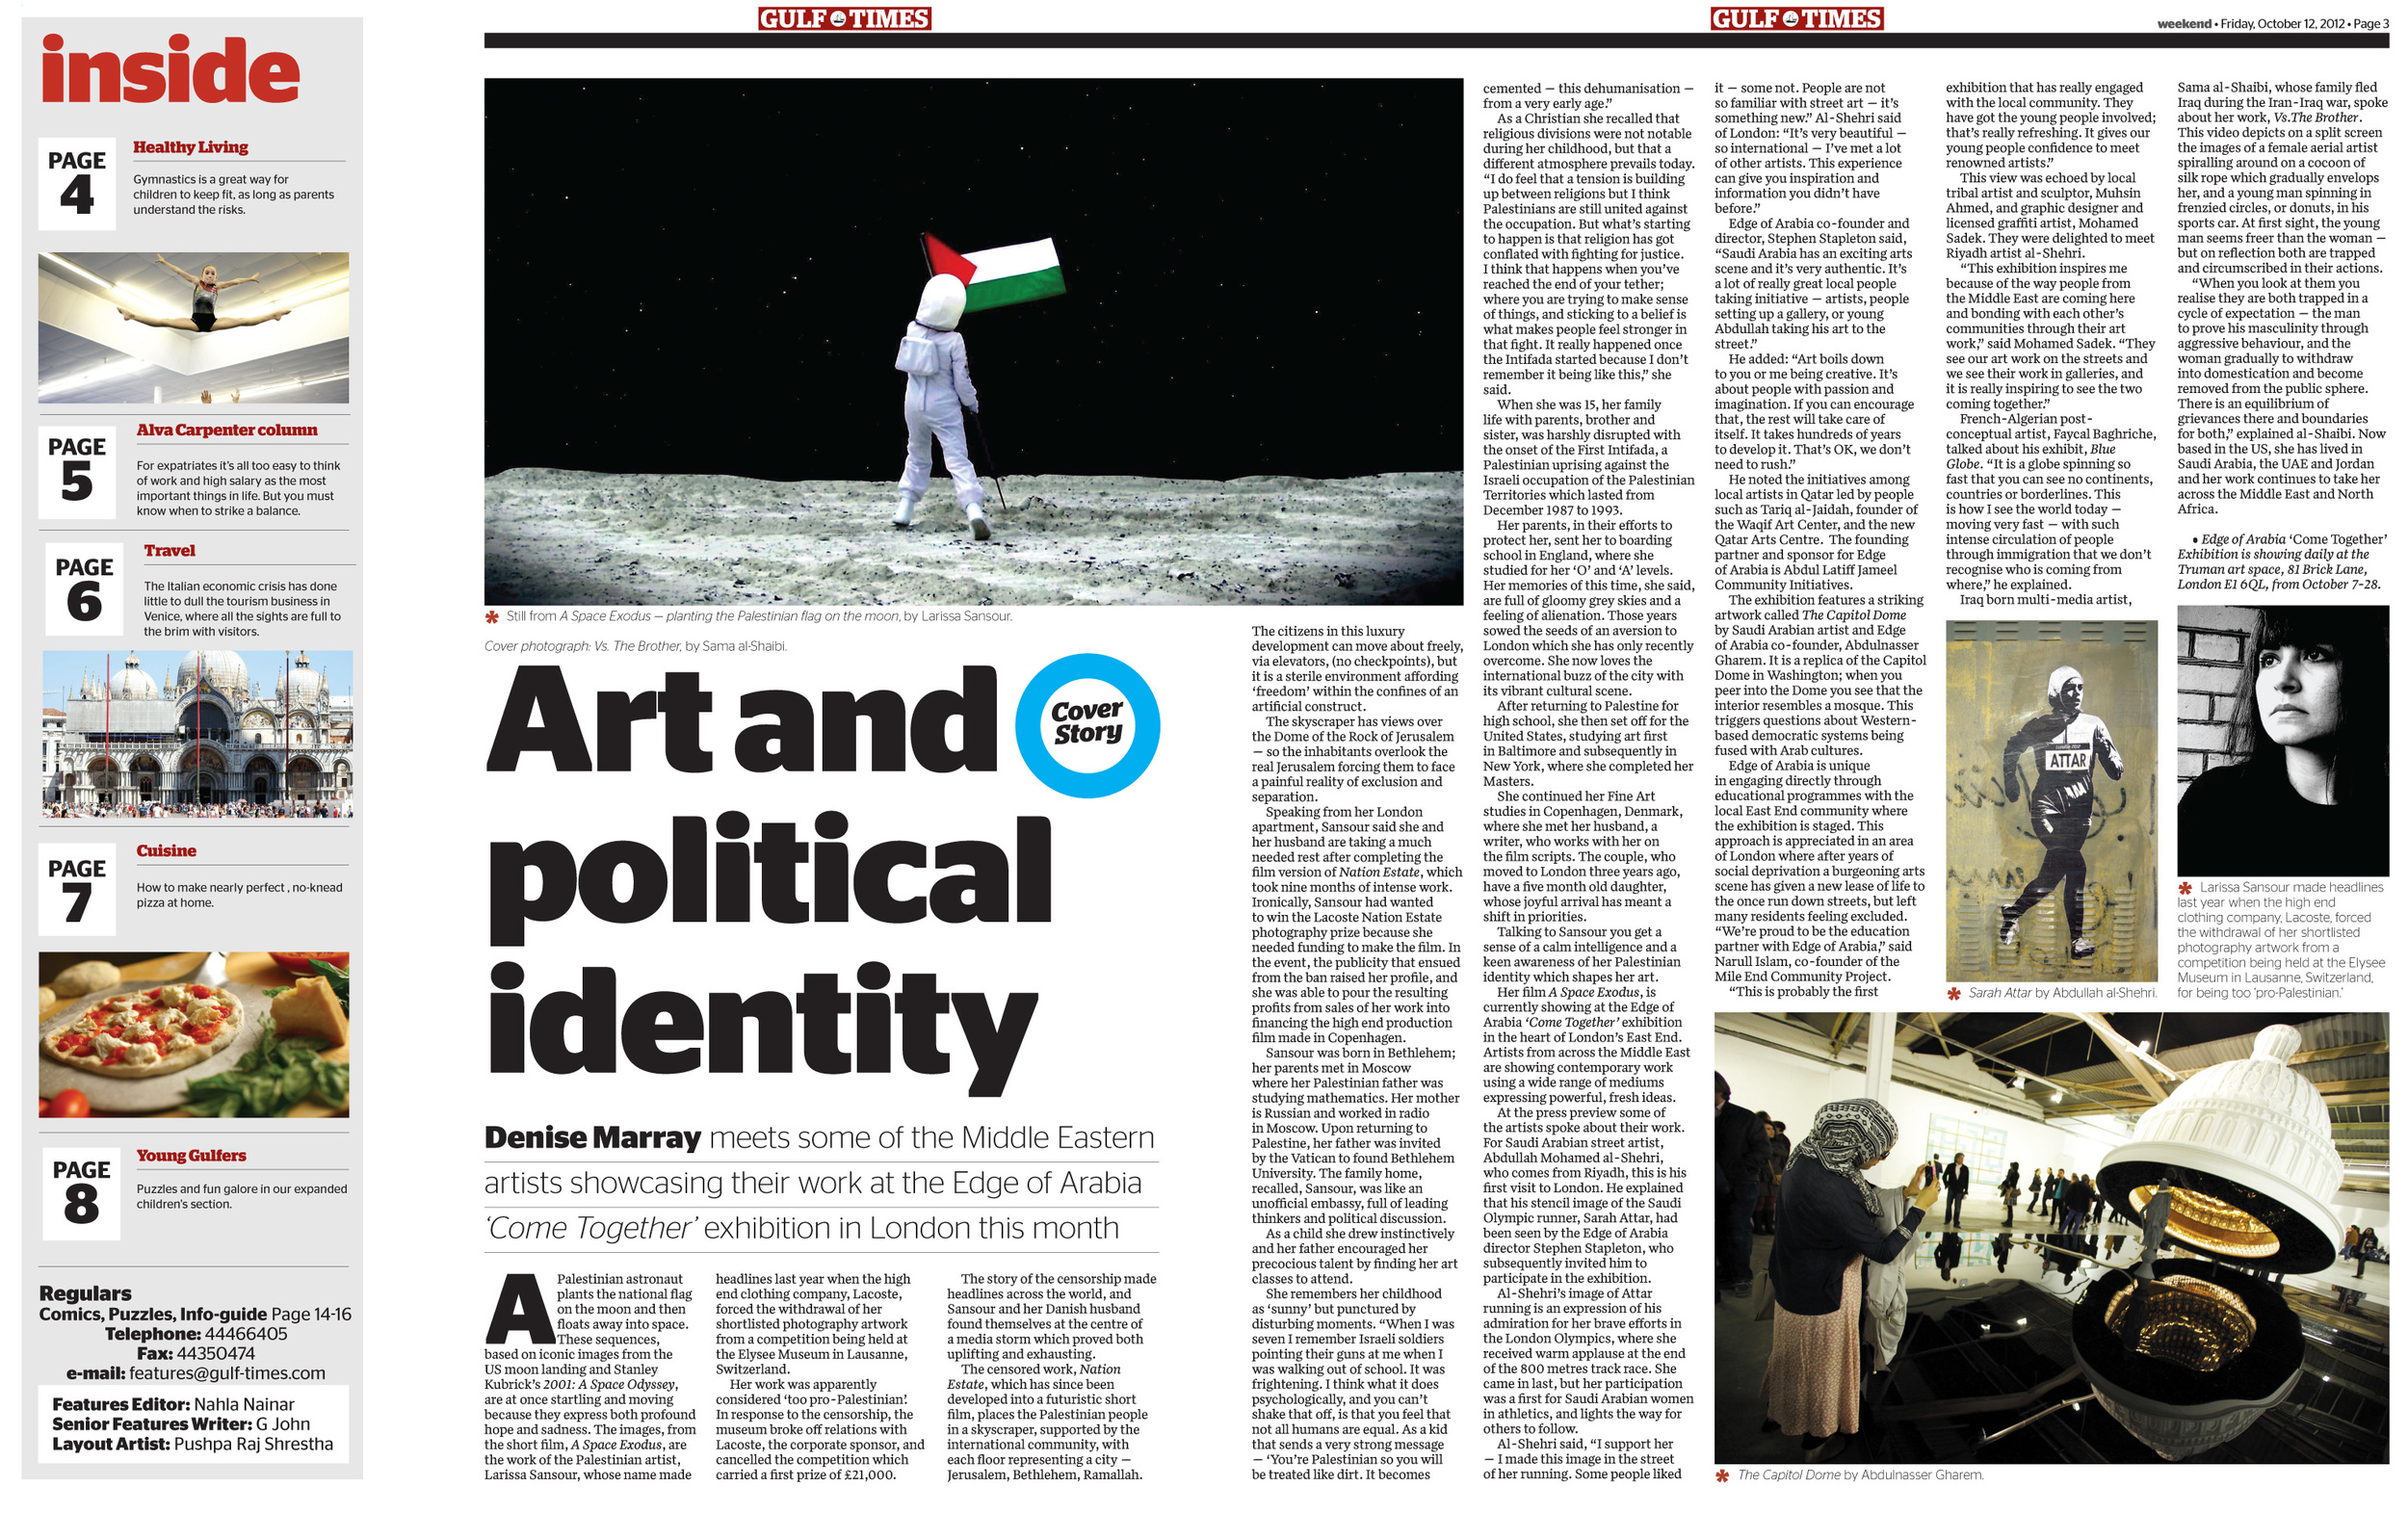 Gulf-Times-Weekend-Main-12.jpg